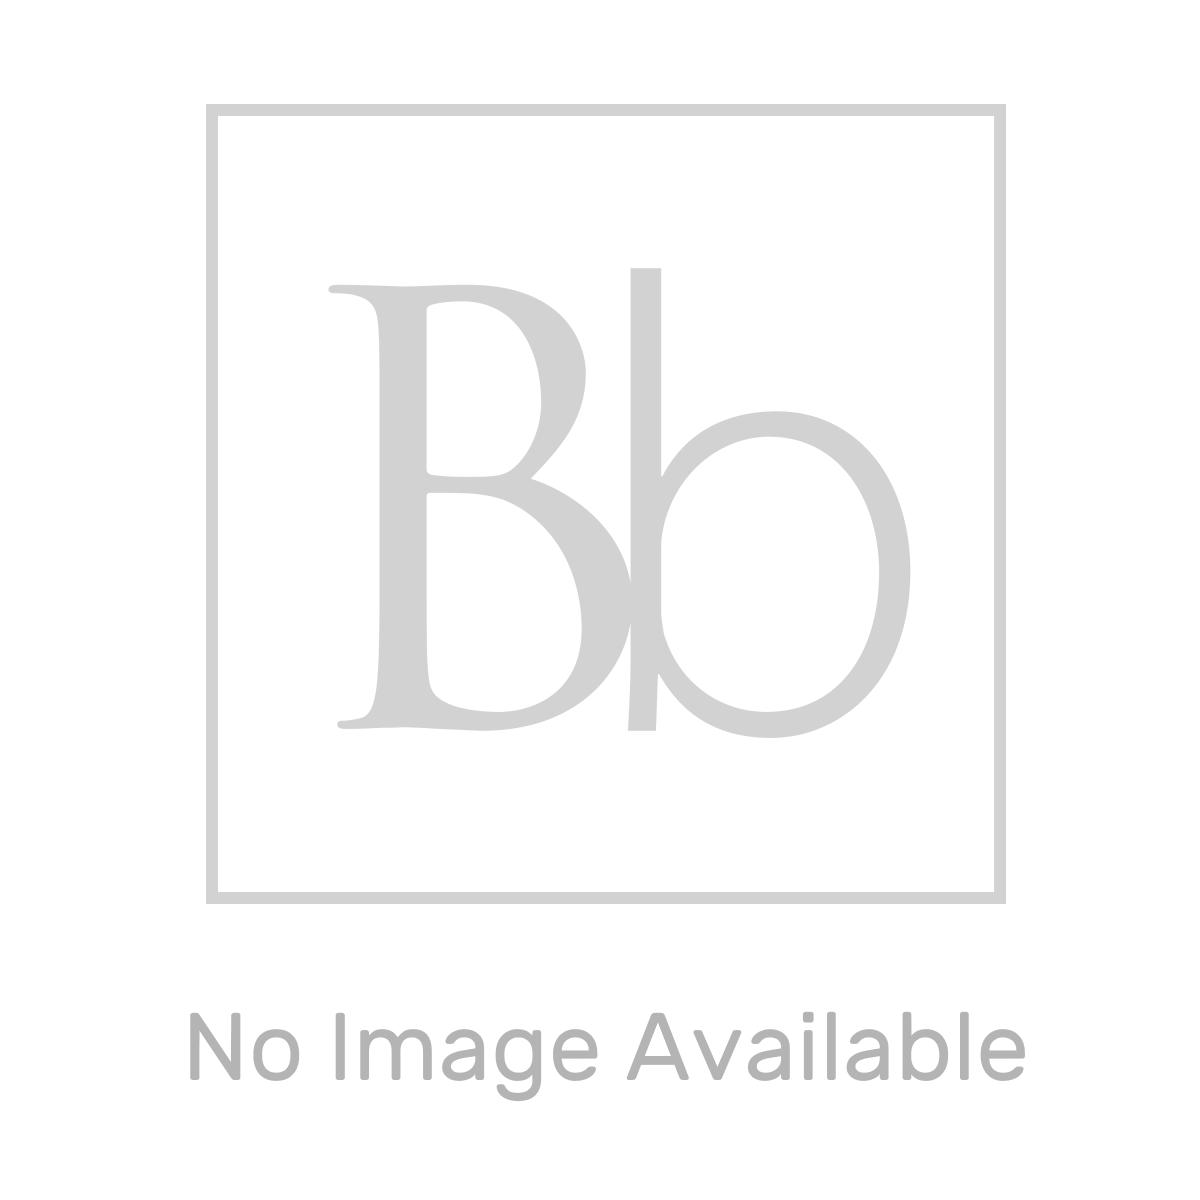 Zenith Carno Bath Shower Mixer Tap